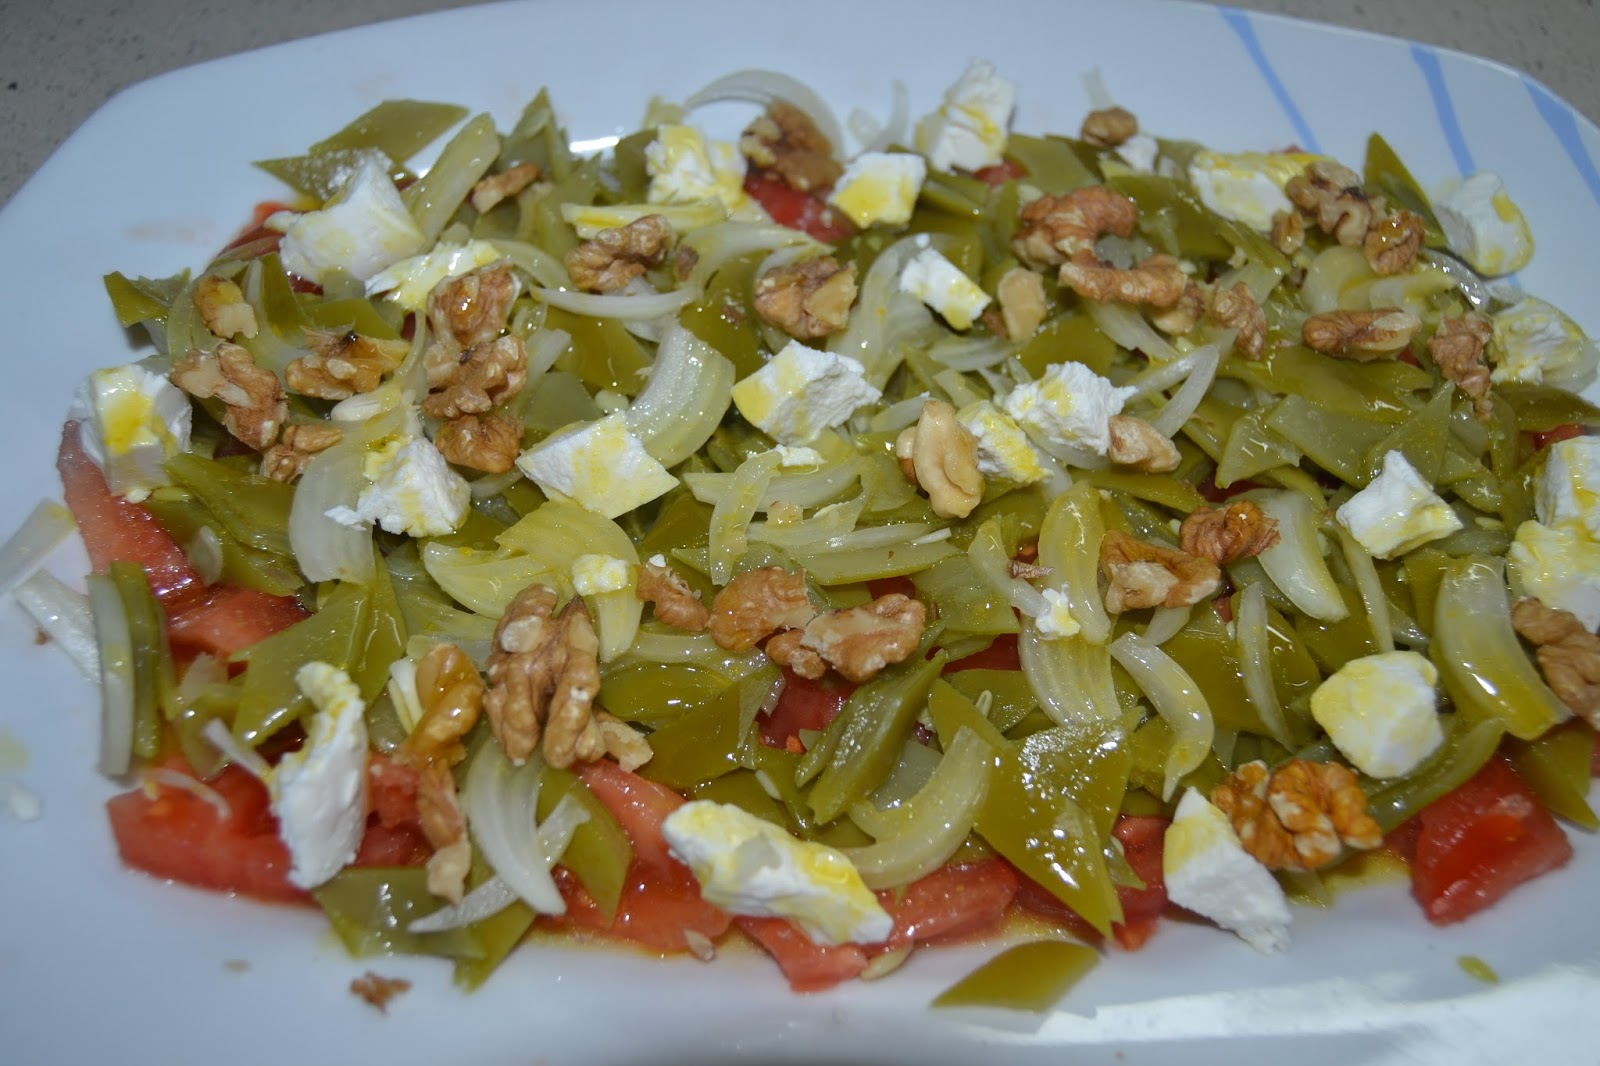 Mi taller de cocina ensalada de judias verdes - Ensalada de judias verdes arguinano ...